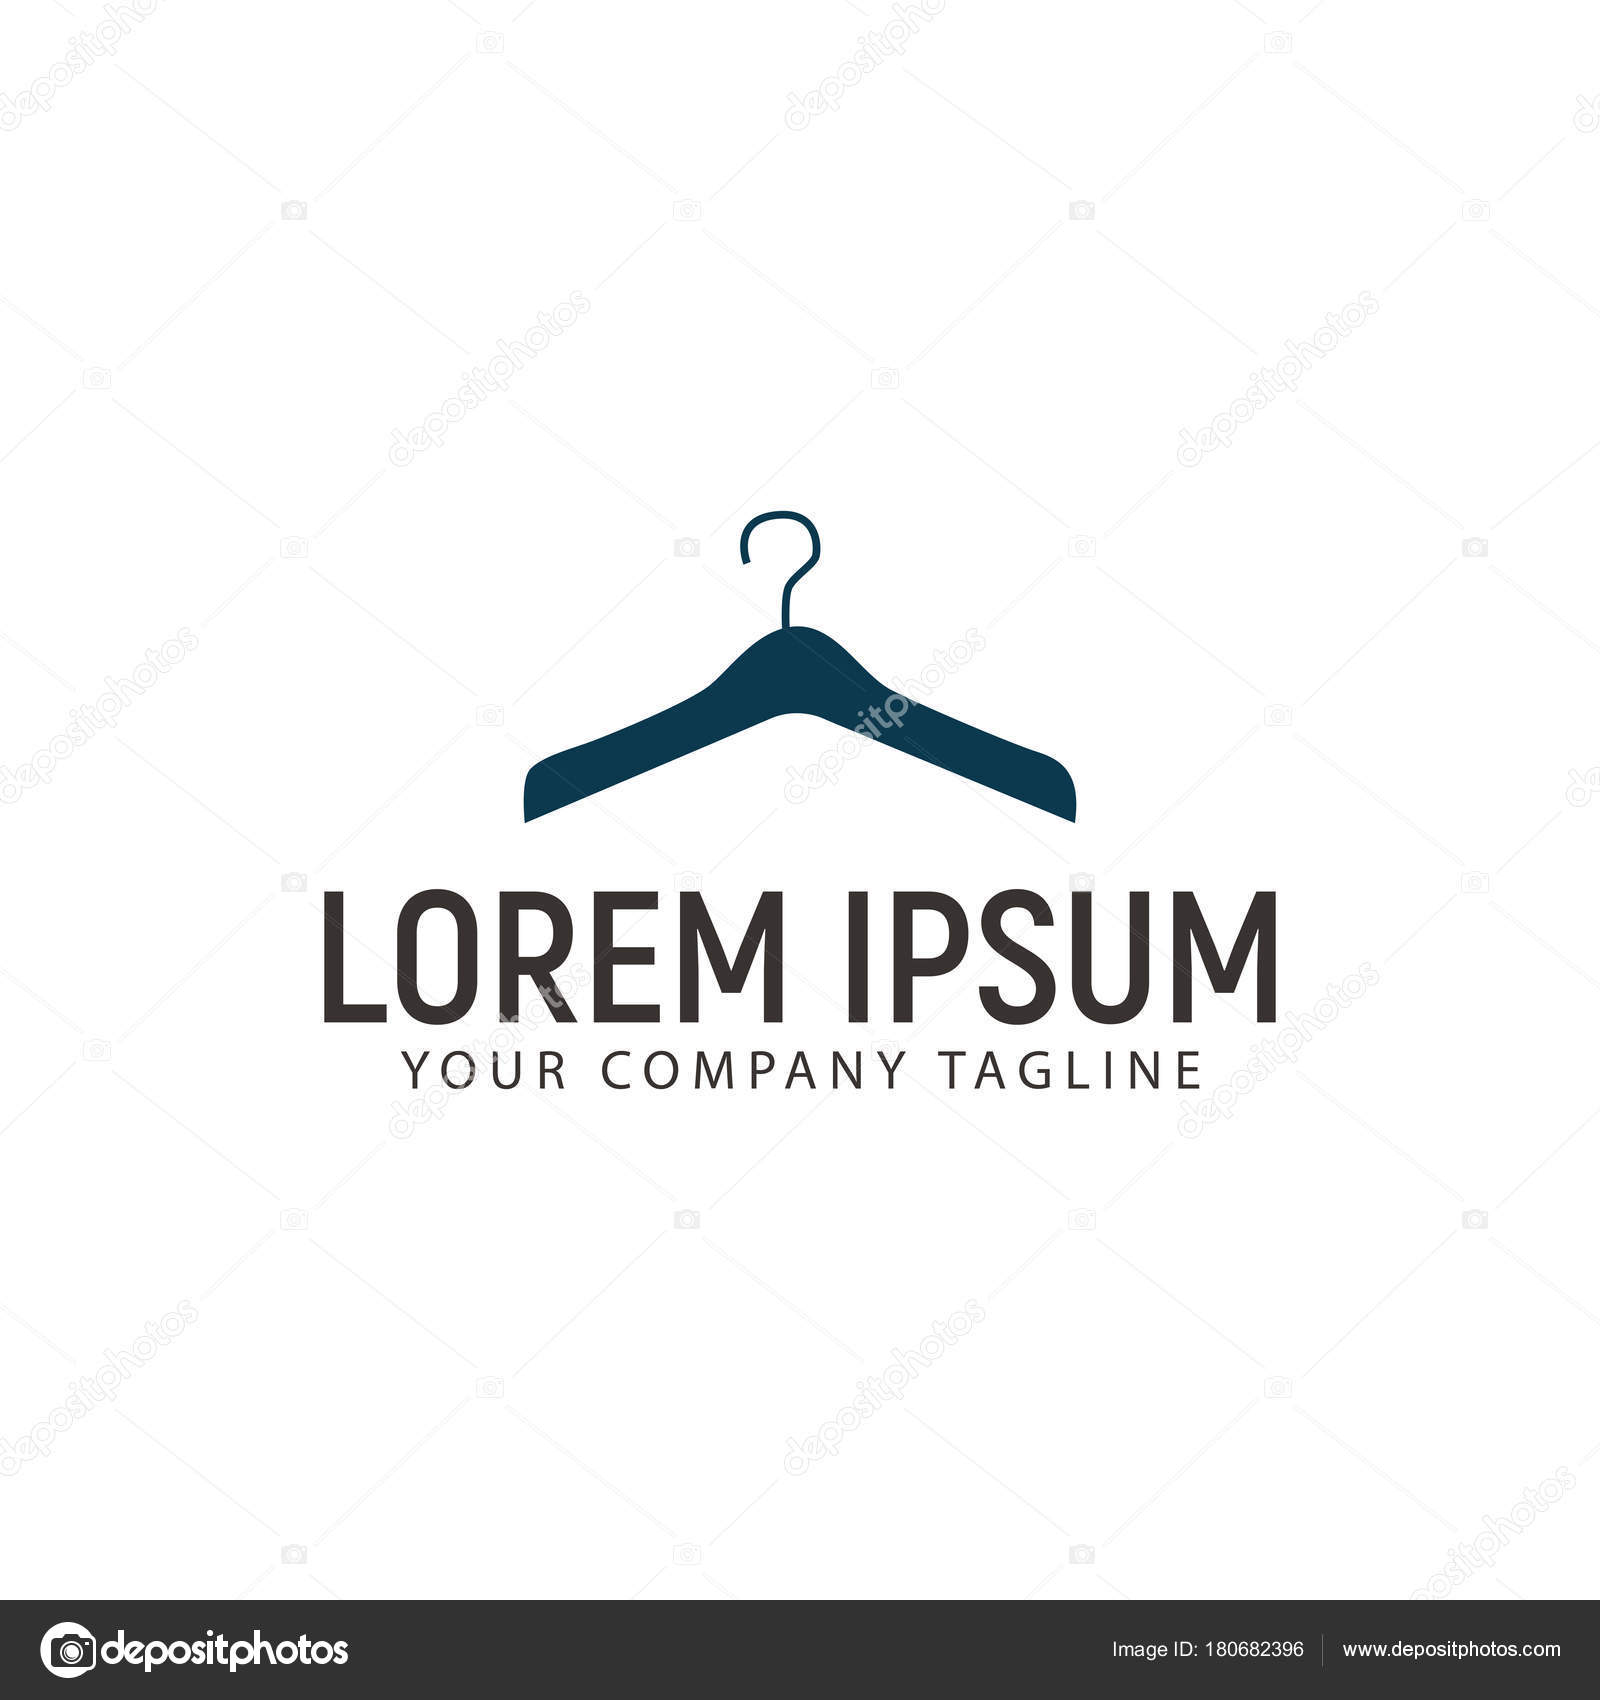 Kleiderbgel kleidung logo design konzept vorlage stockvektor kleiderbgel kleidung logo design konzept vorlage stockvektor thecheapjerseys Images